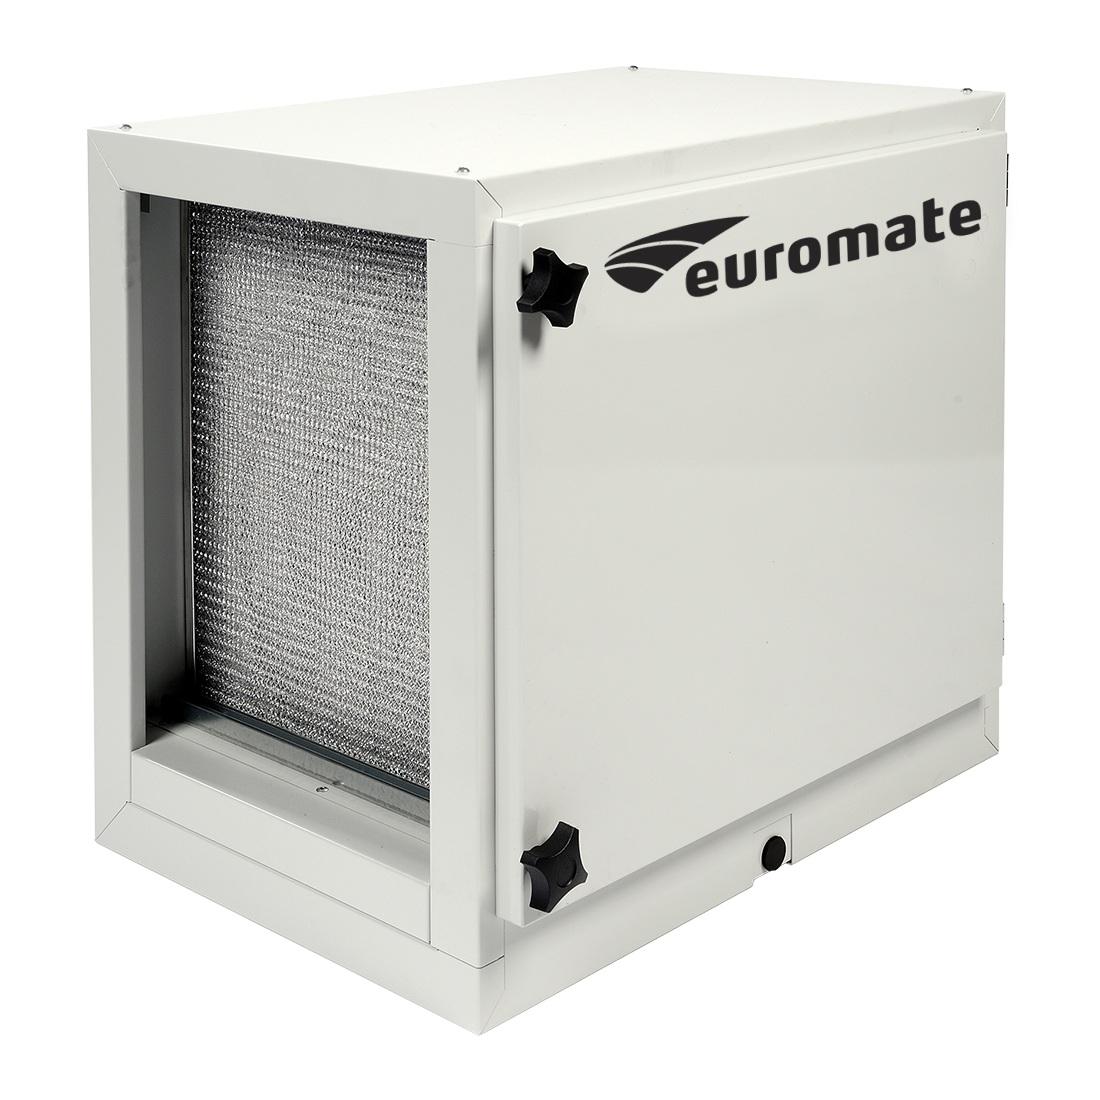 Профессиональные воздухоочистители | Воздухоочиститель Euromate (Plymovent) SFС-25